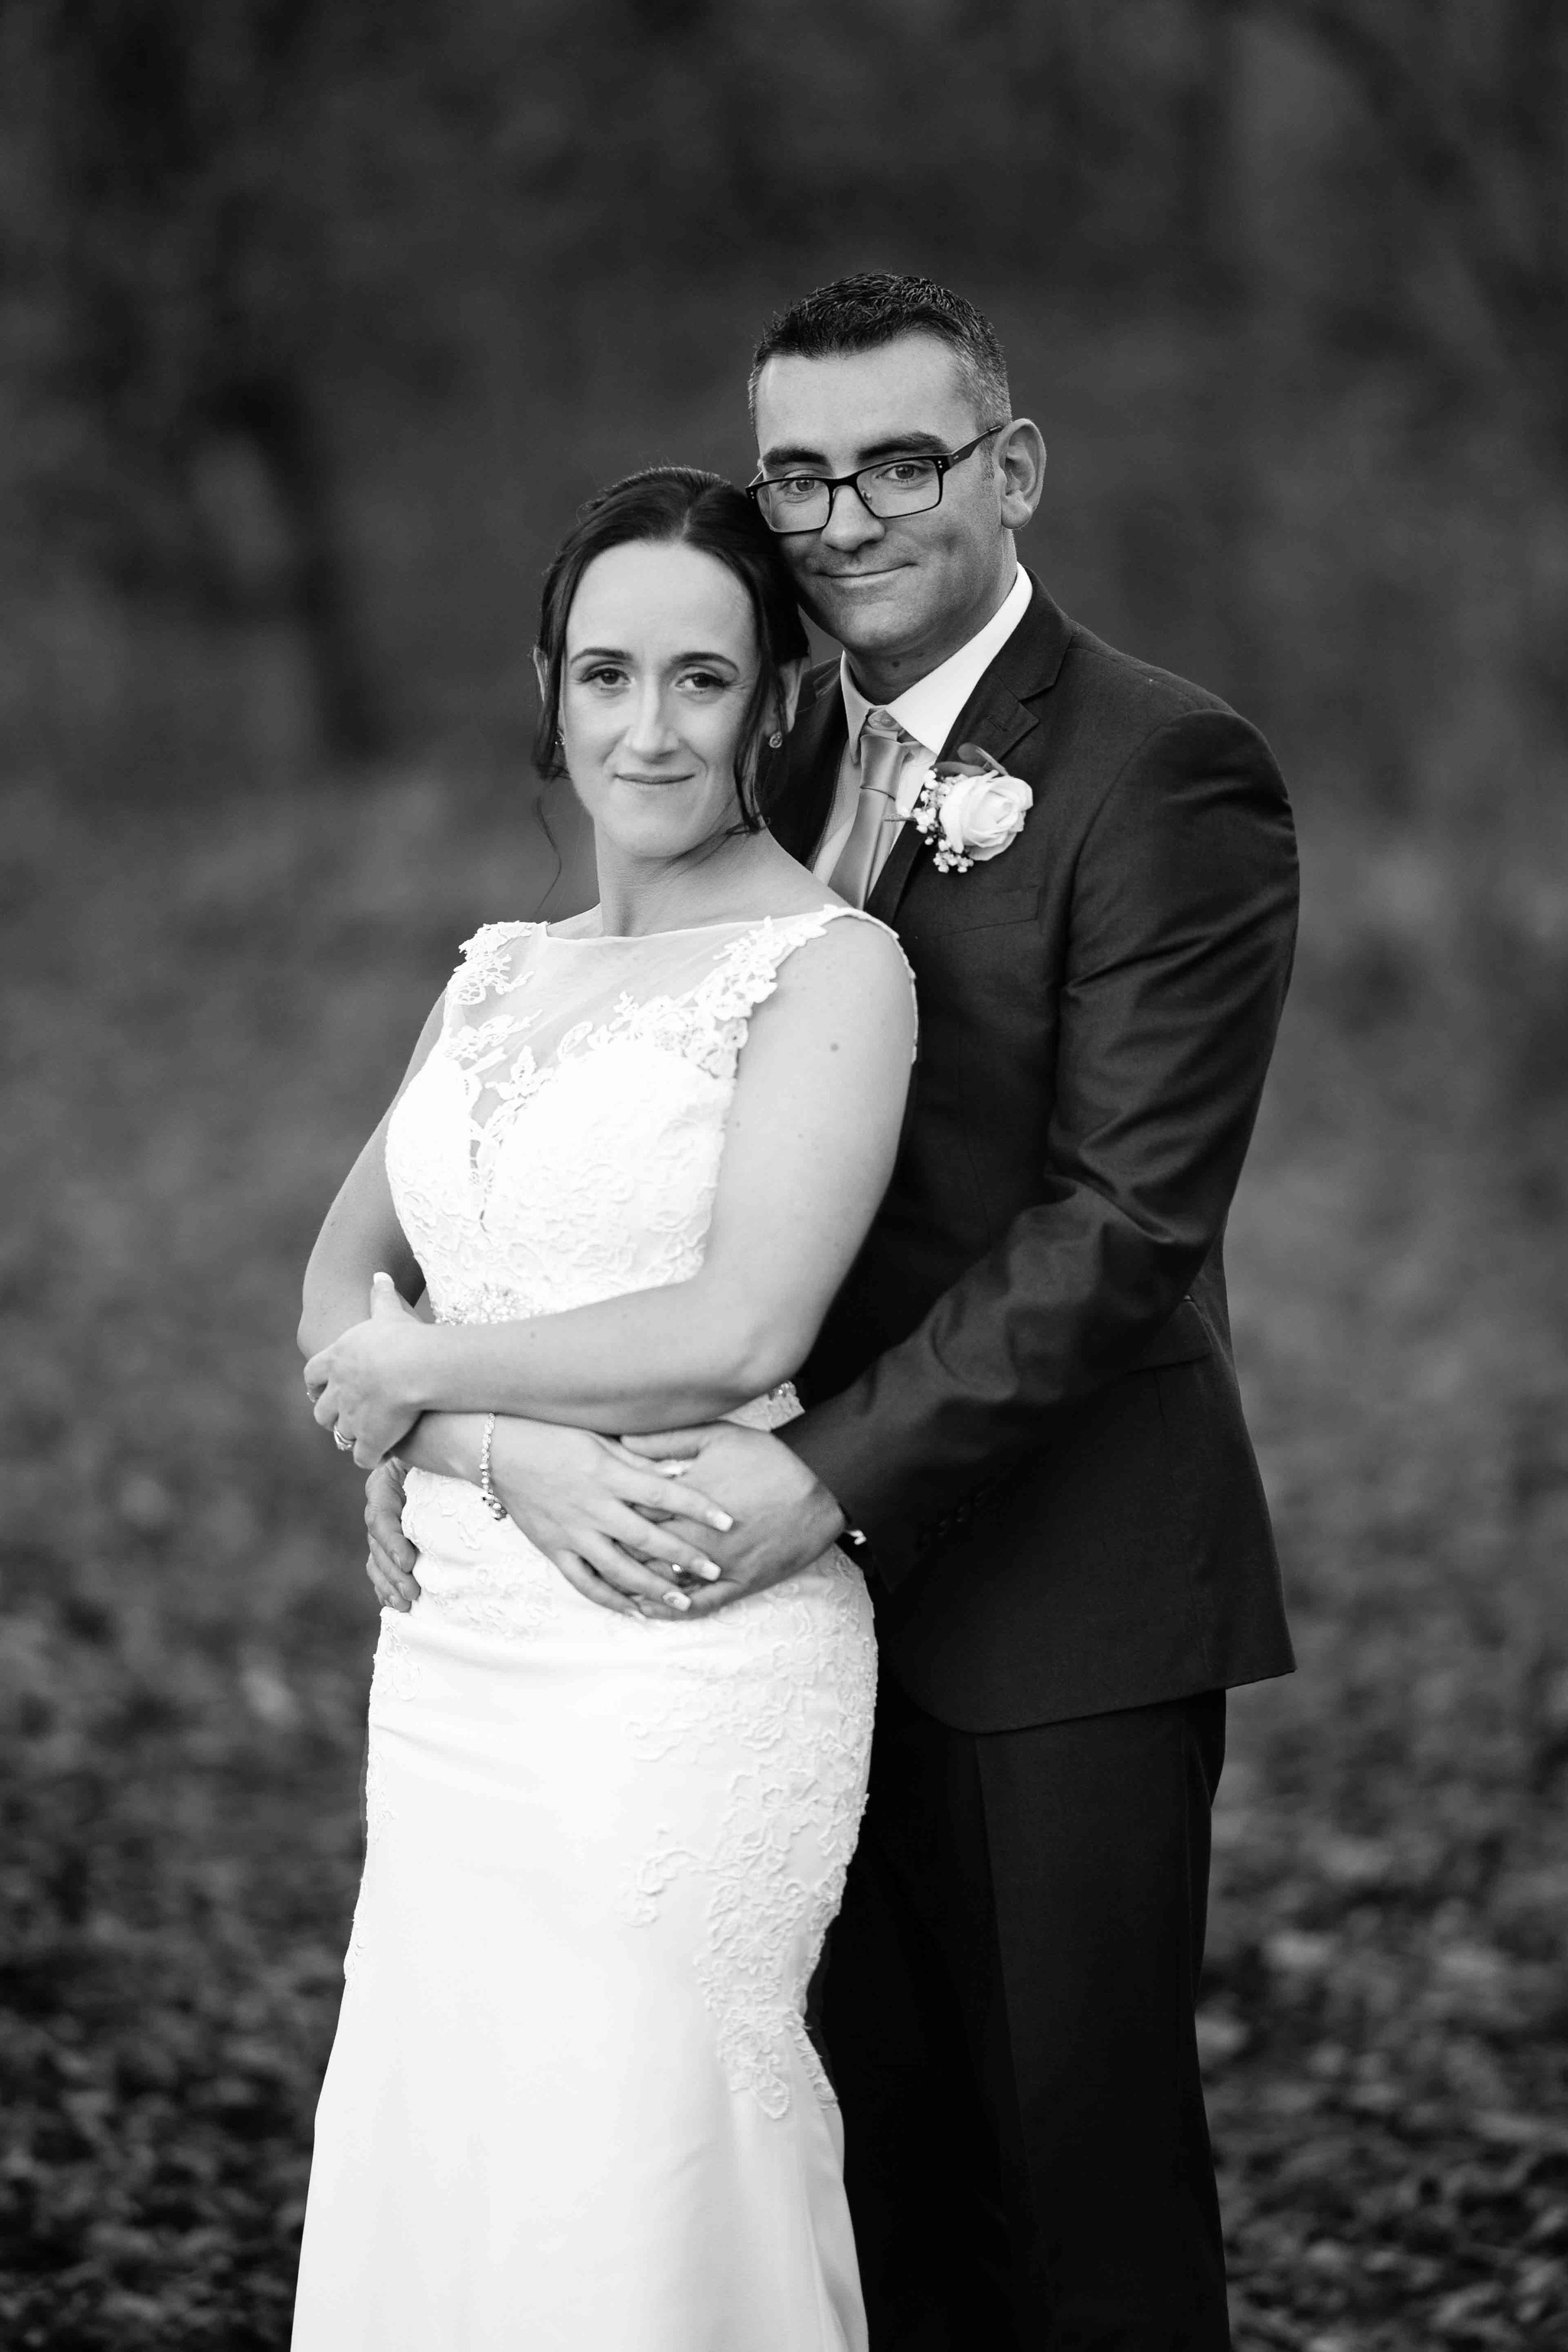 wedding-photos-willenhall-wedding-photographer-wolverhampton-wedding-photographer-west-midlands-wedding-photographer-birmingham-bride-and-groom-photos.jpg